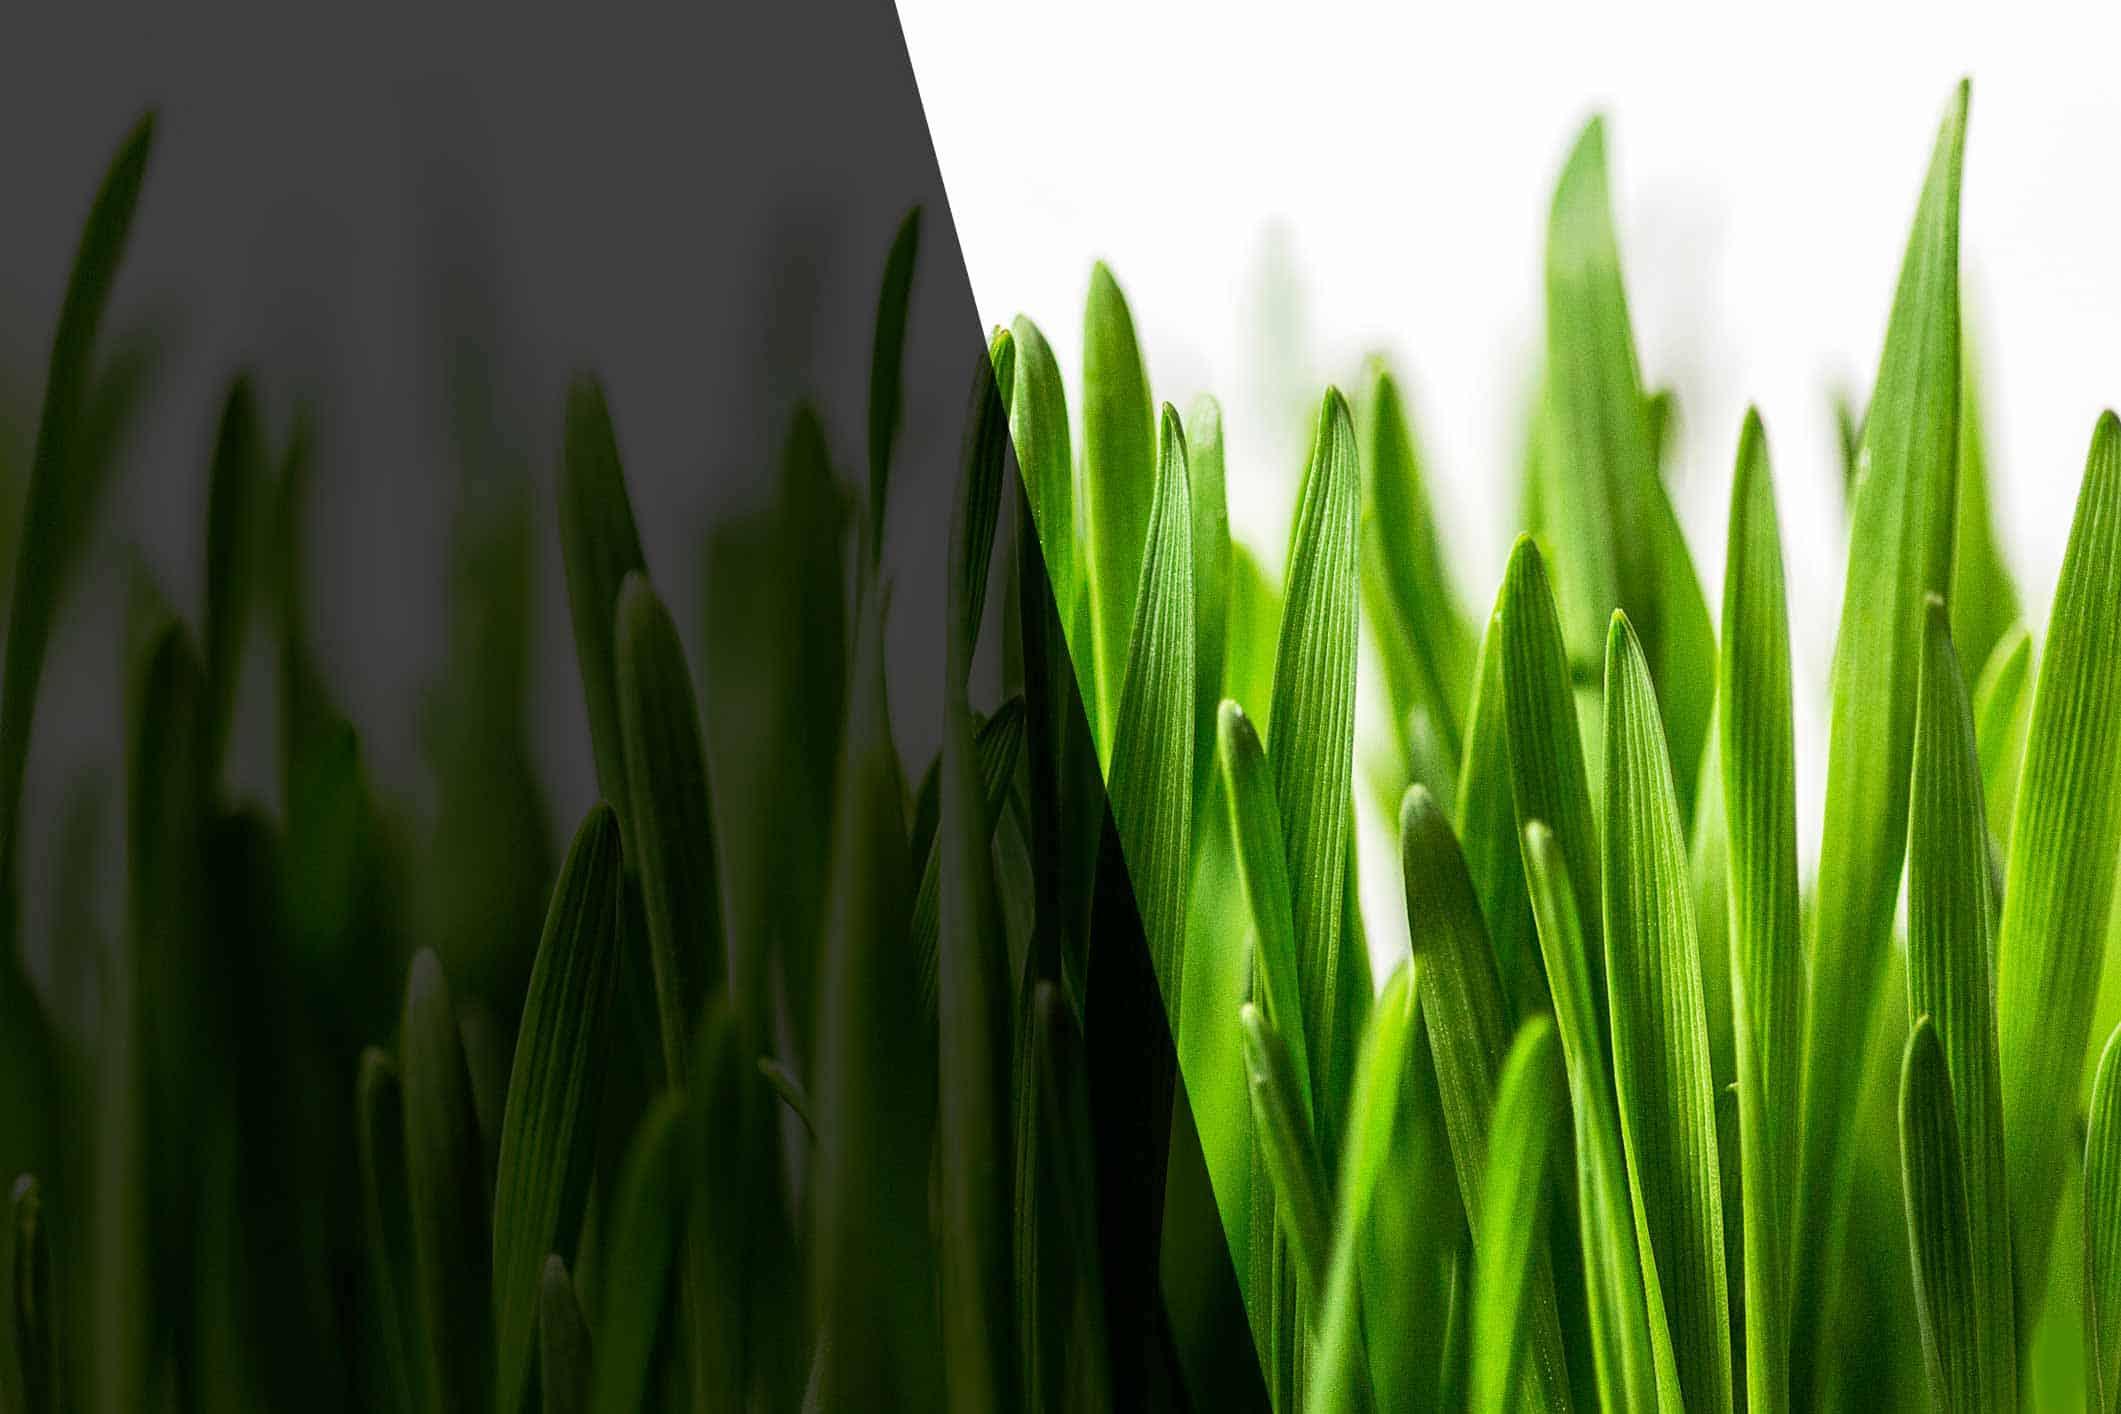 The Grass is Not Always Greener   Mekanic